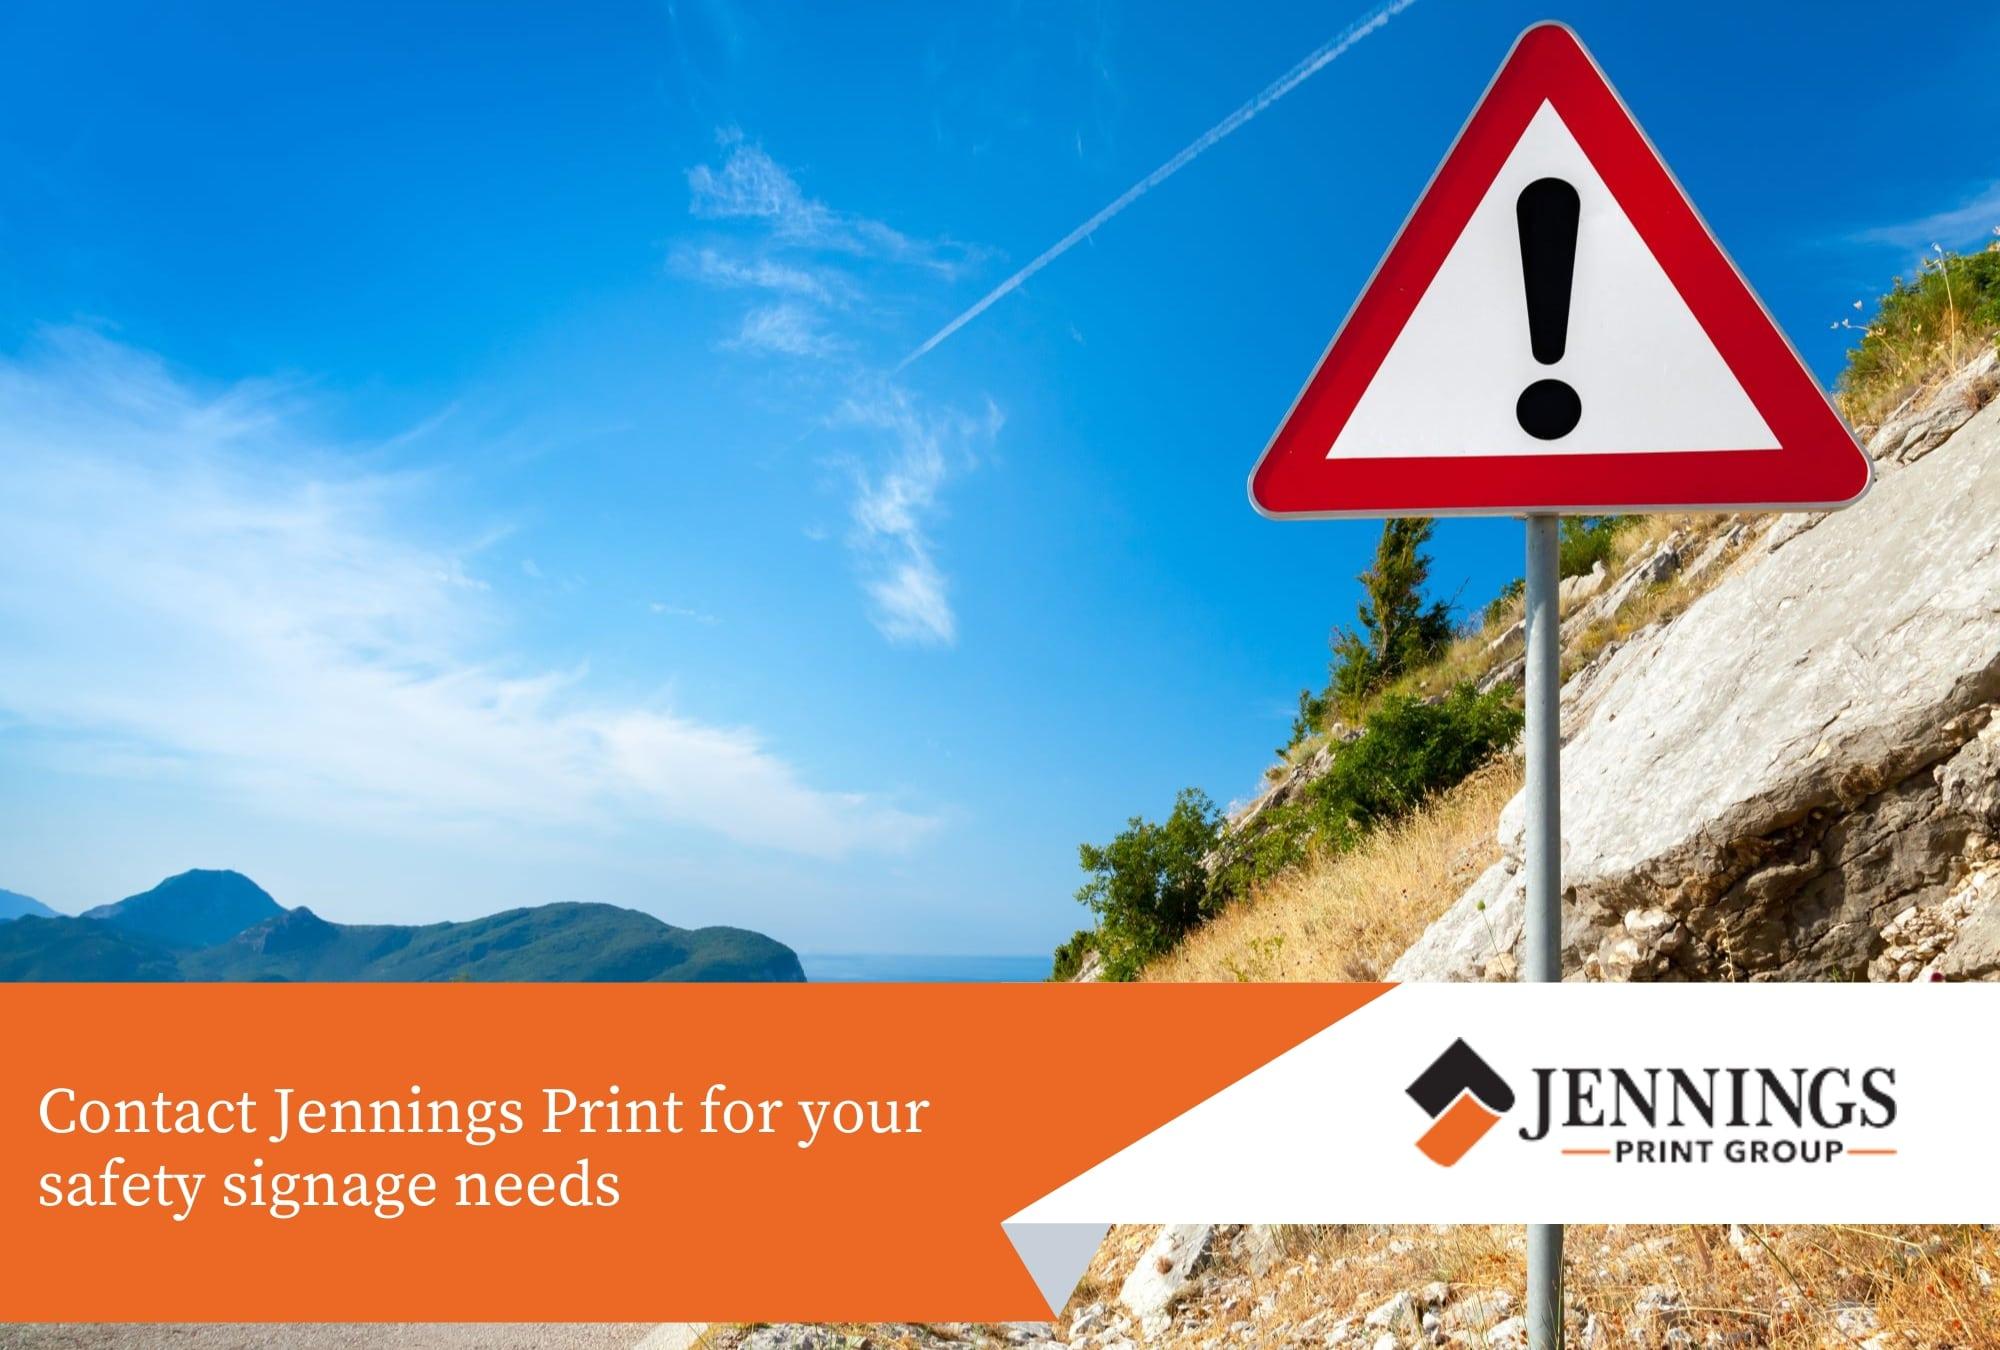 Contact Jennings